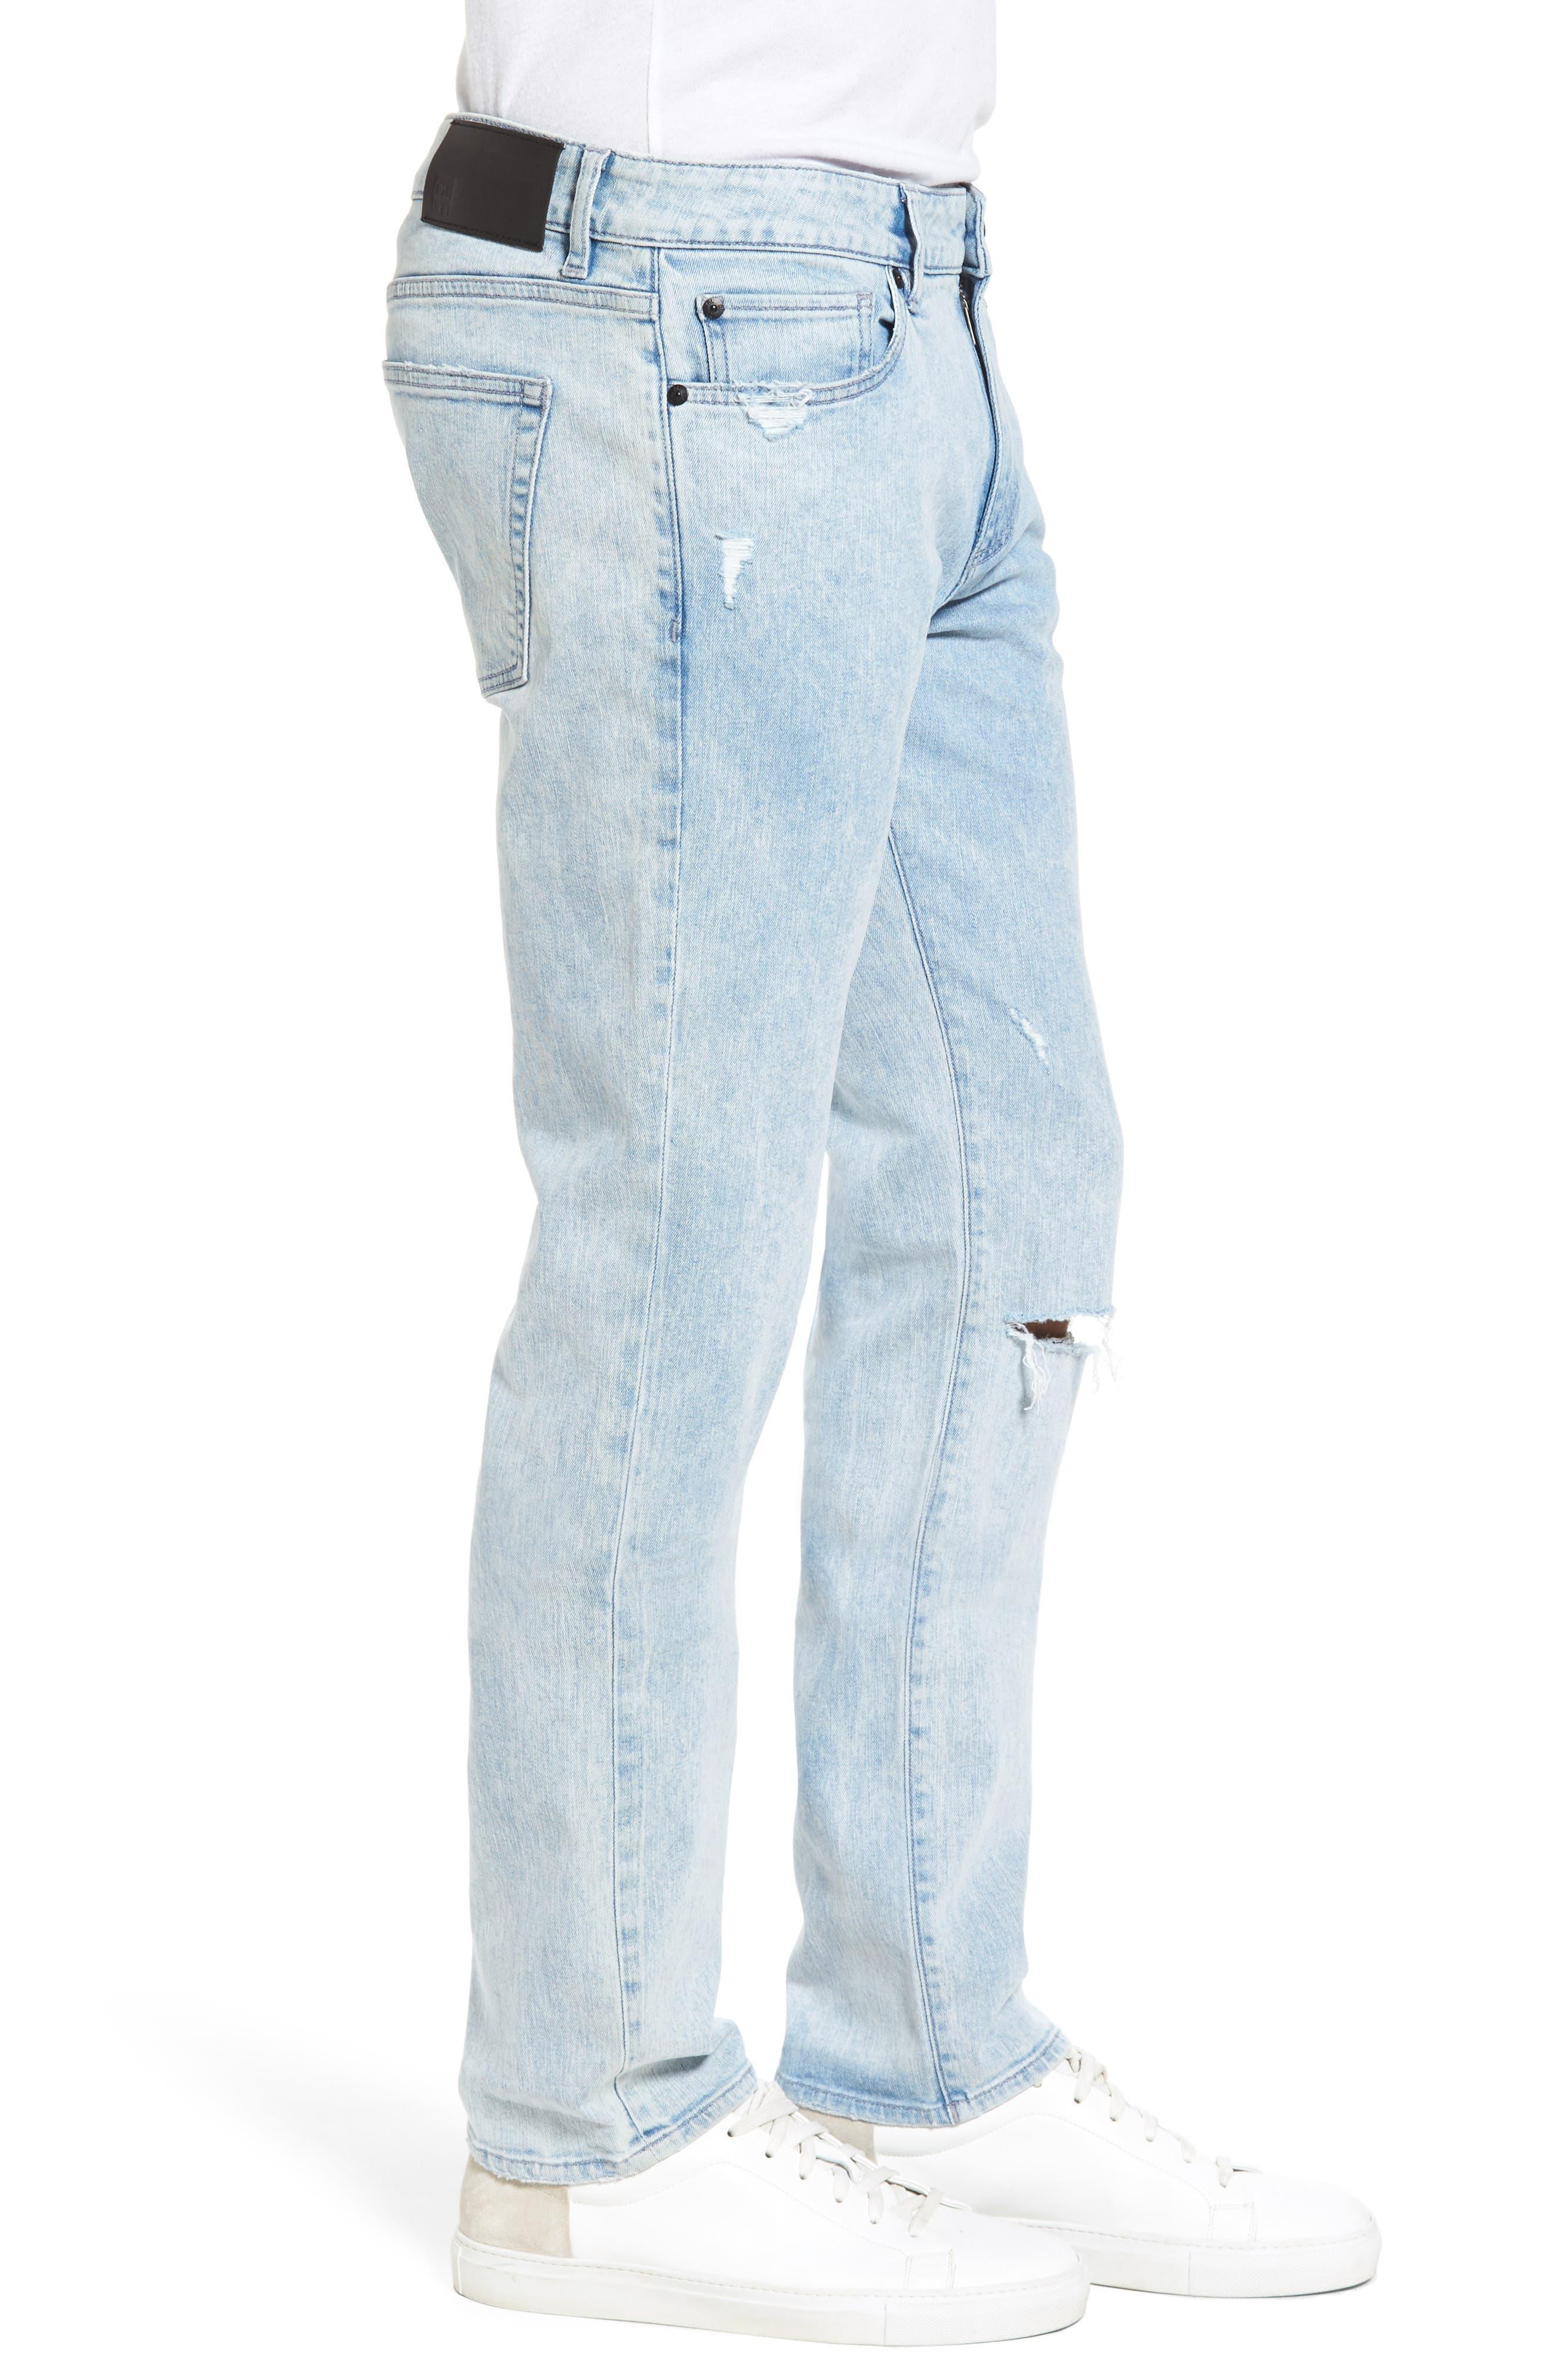 Nick Slim Fit Jeans,                             Alternate thumbnail 3, color,                             TORRENT